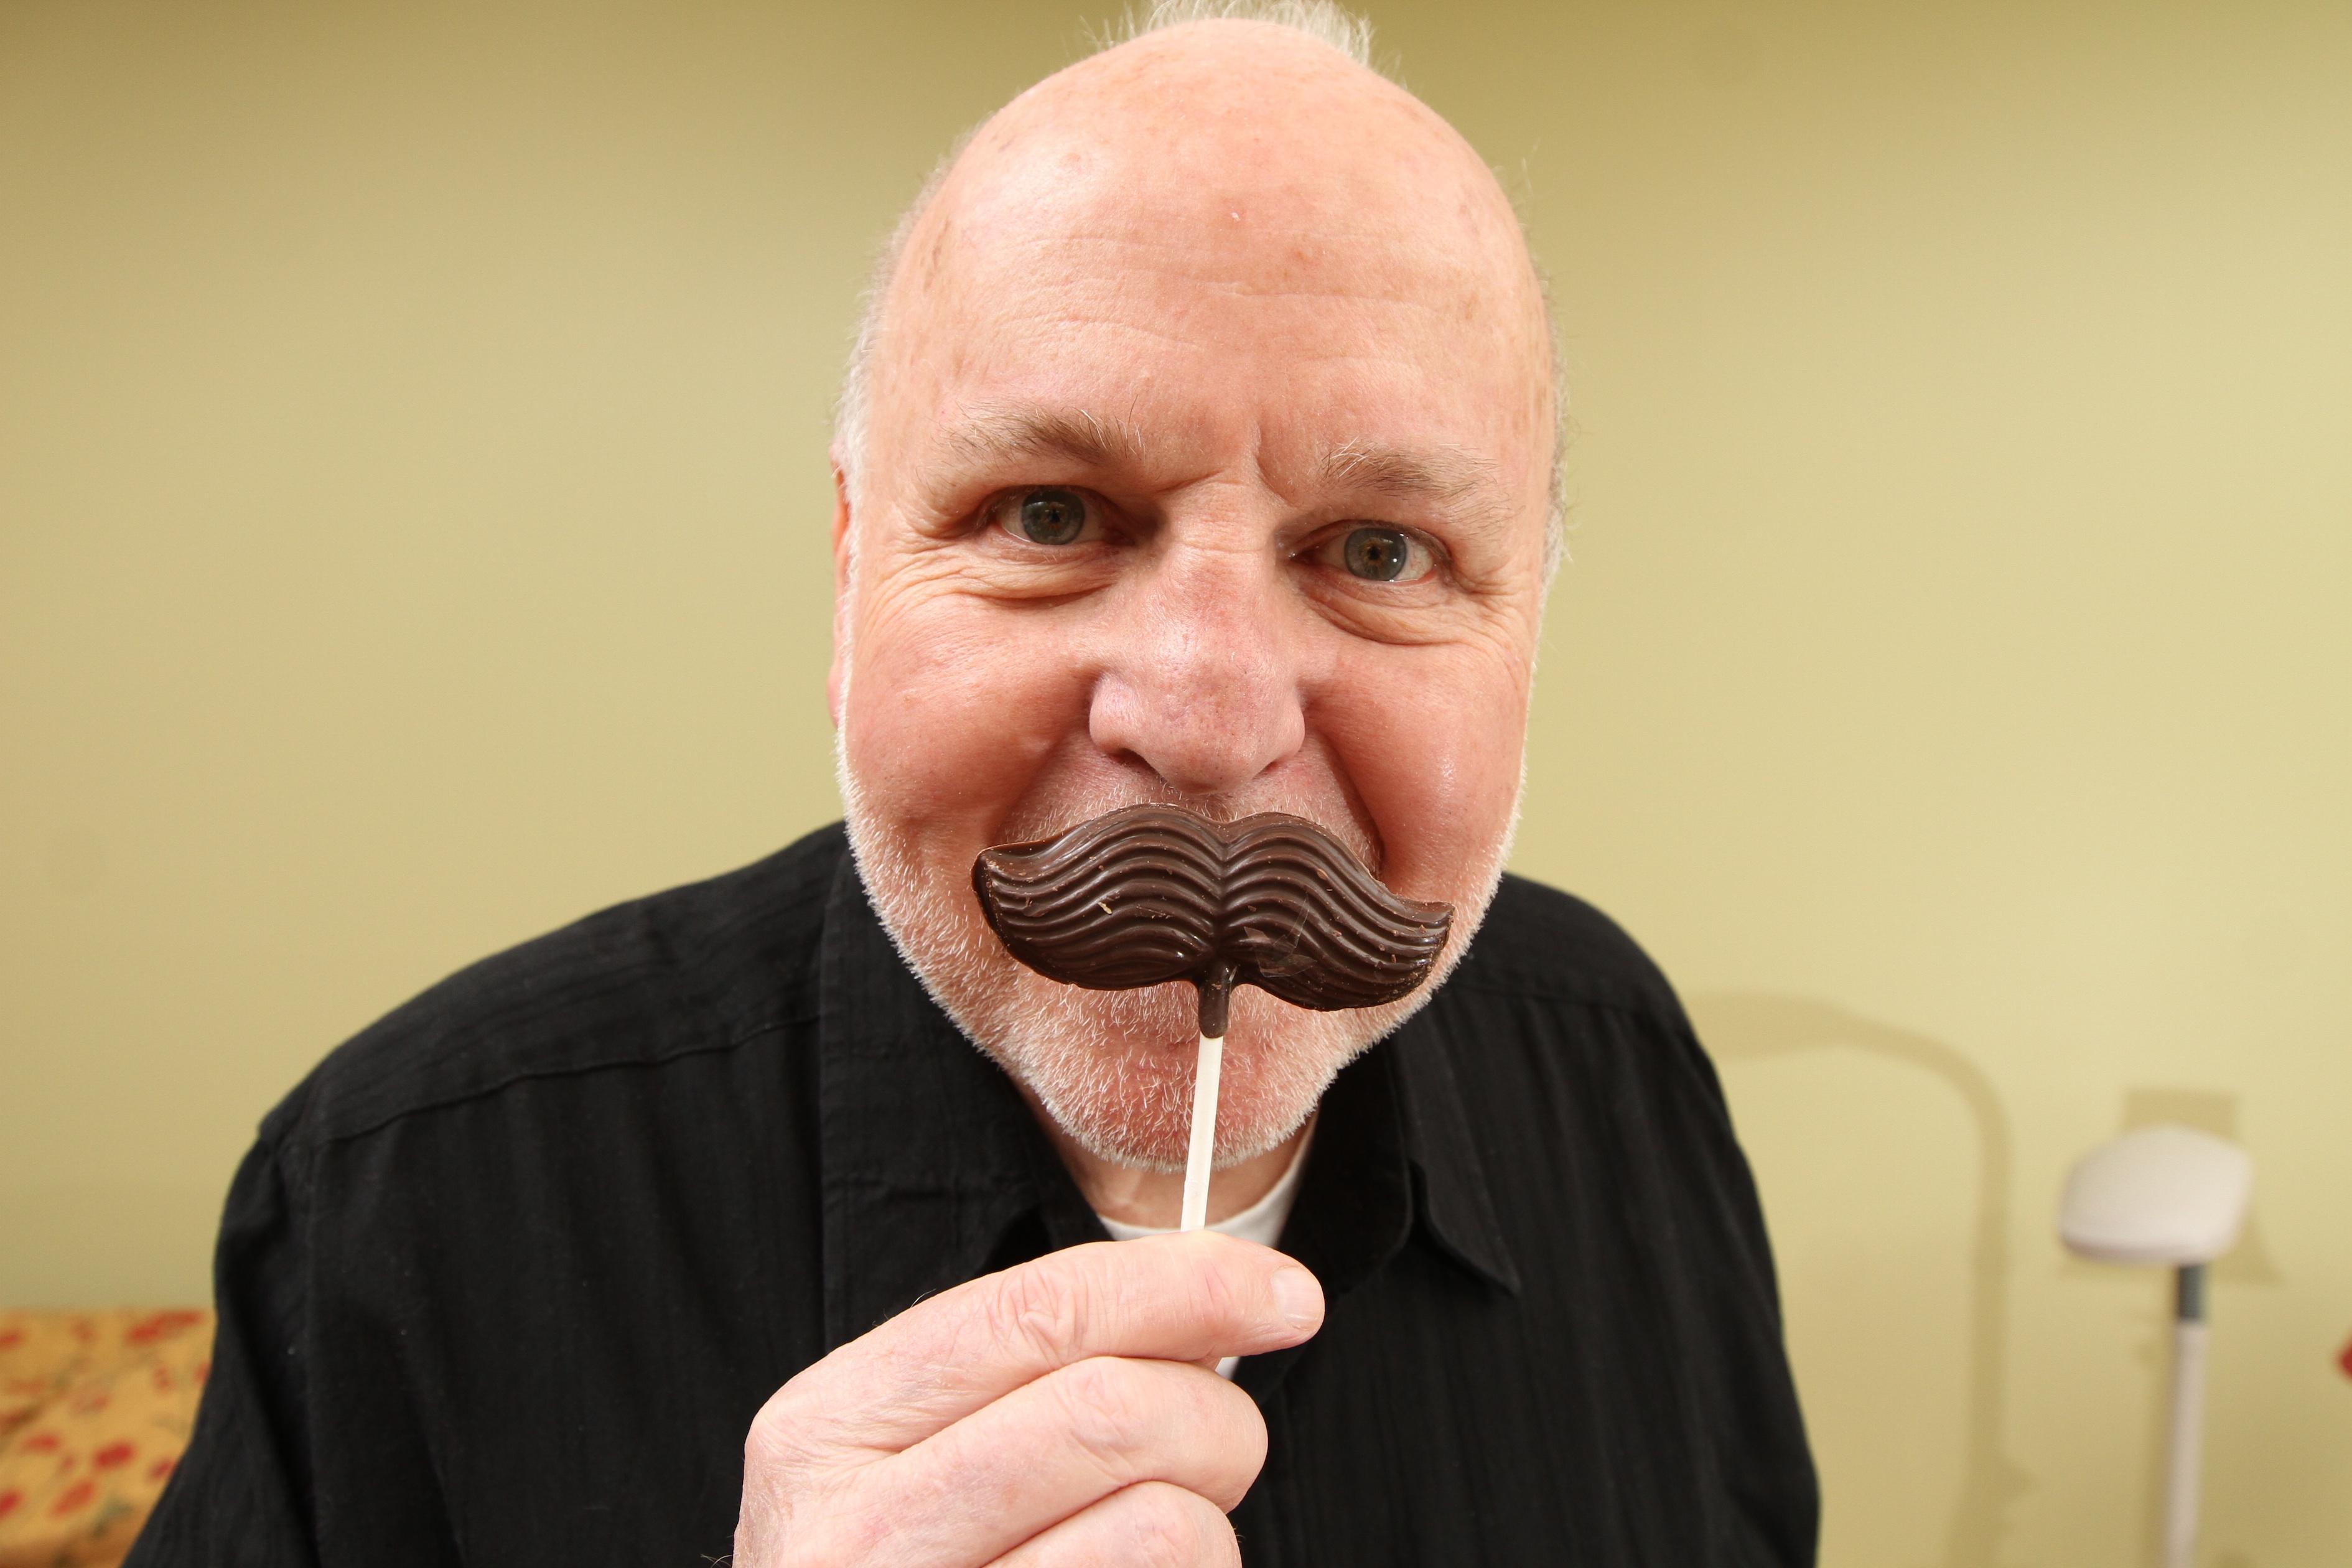 "Photoâ€""J. Patrick Lewis with Chocolate Mustache"